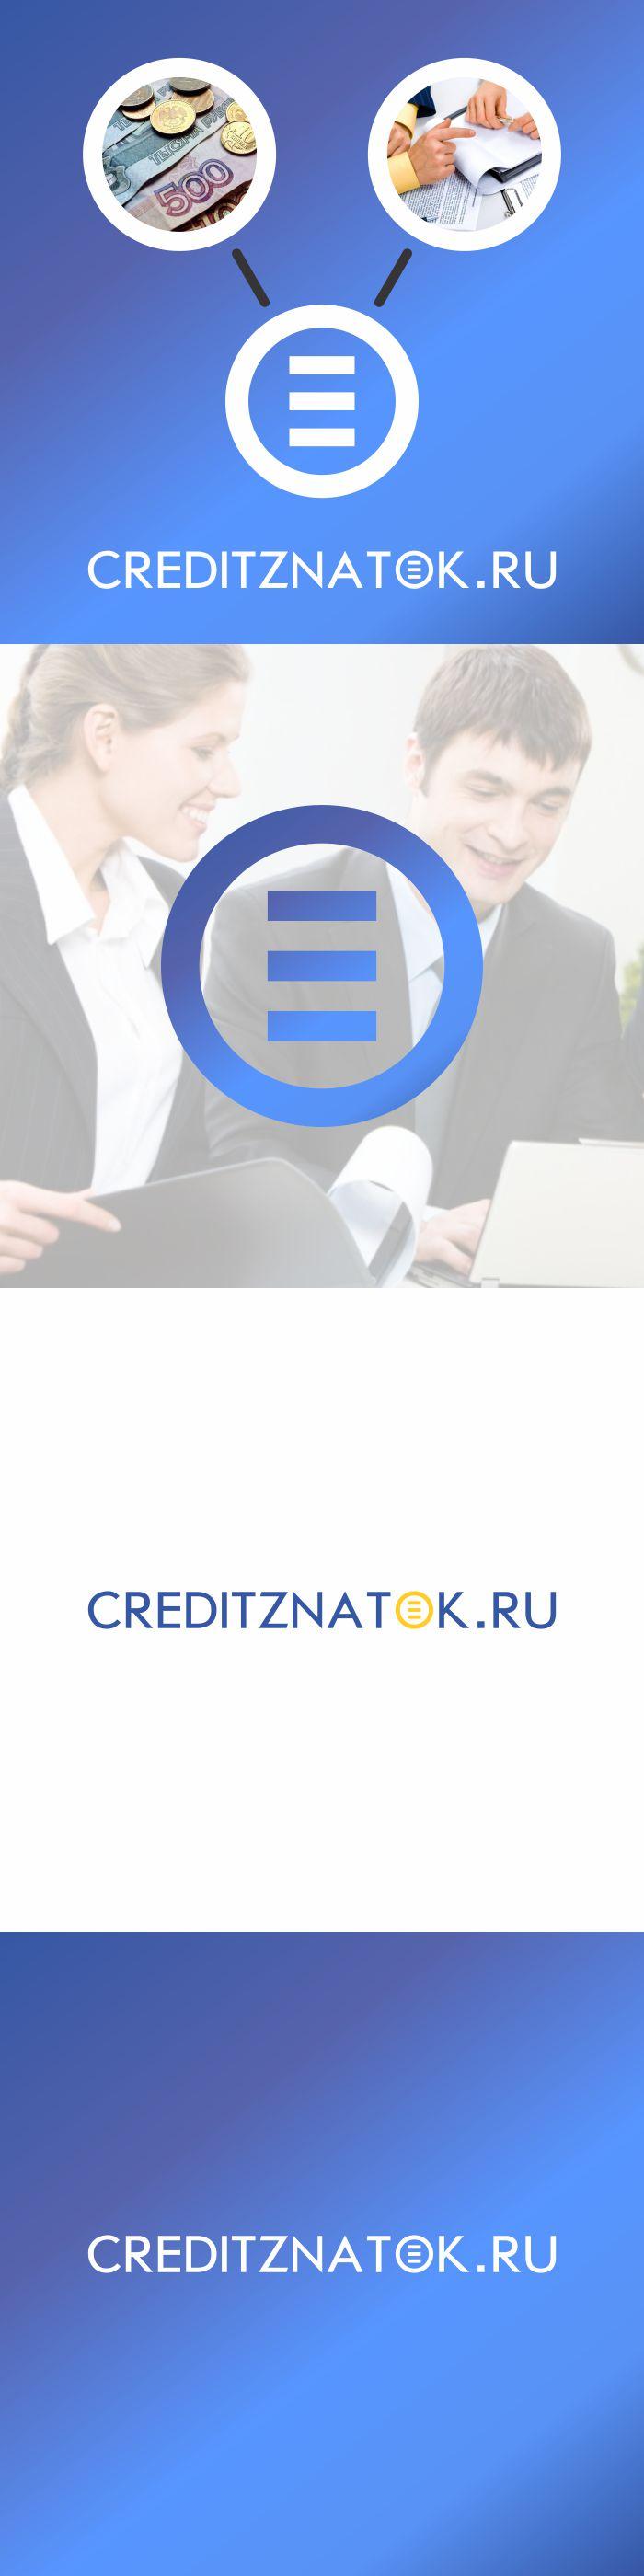 creditznatok.ru - логотип фото f_2195897666f0cc2a.jpg